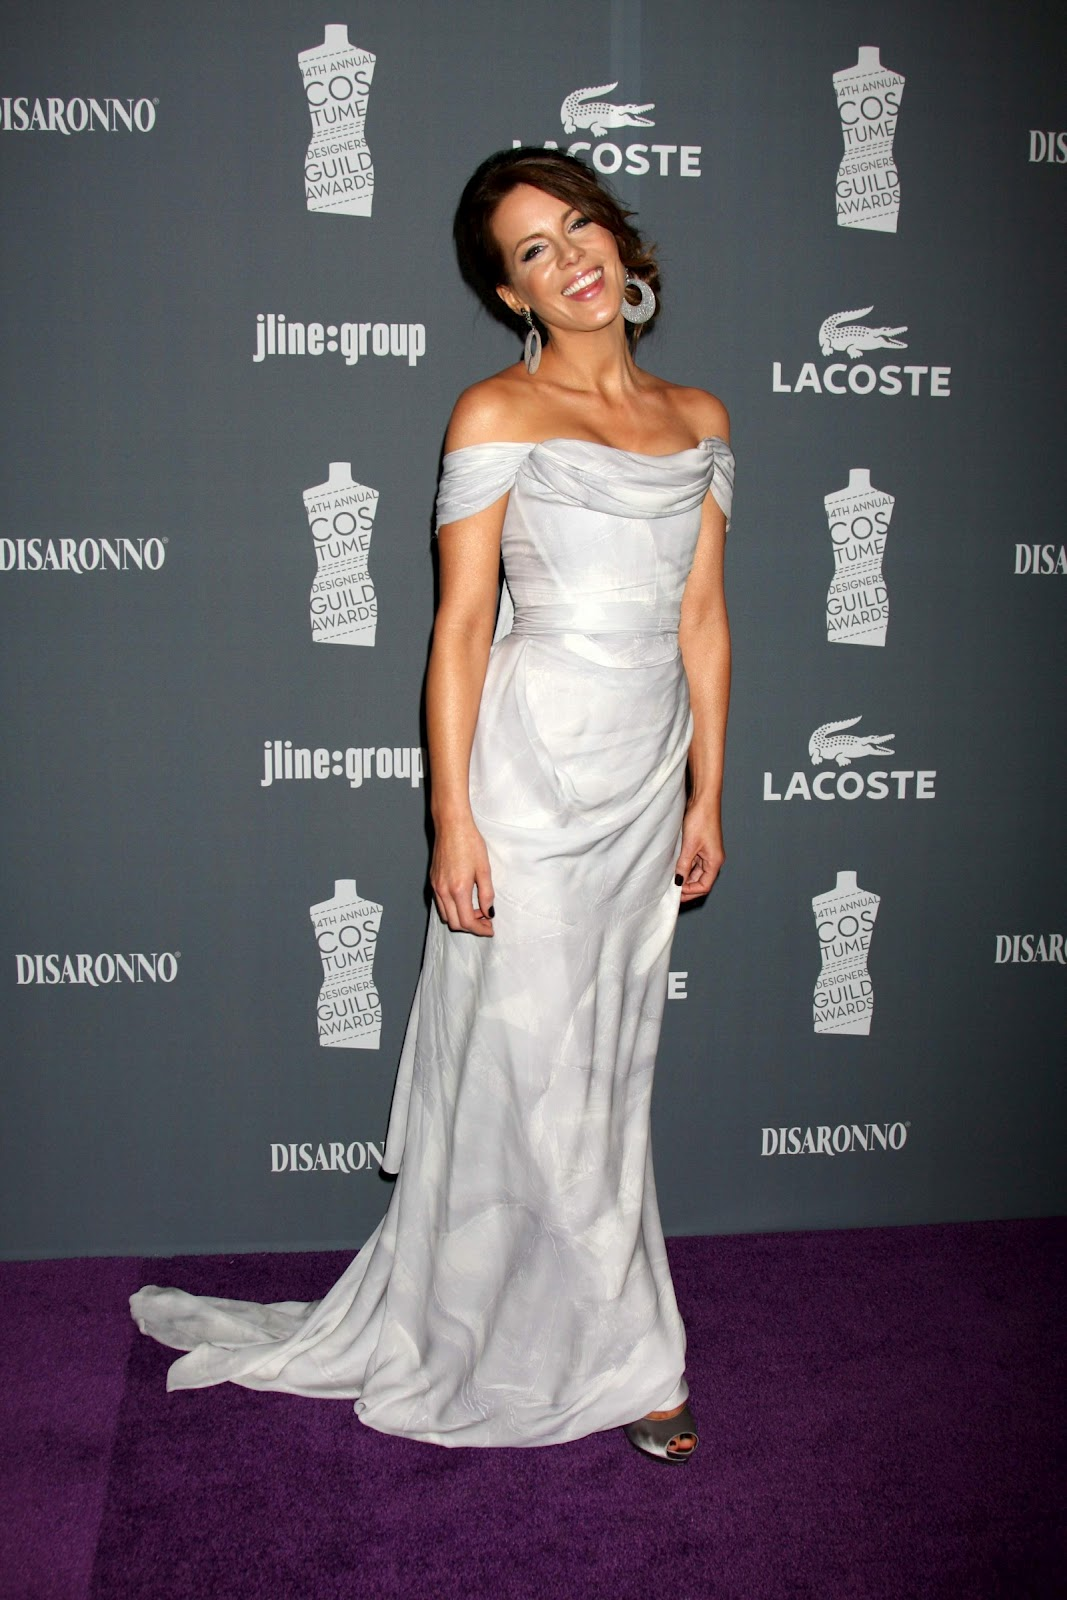 http://1.bp.blogspot.com/-hfozDRwjAXY/T1l0UTsgDlI/AAAAAAAAAjI/om7hH0eoYk8/s1600/Kate+Beckinsale+divinely+draped+goddess+www.ModaeAmor.com+002.jpg